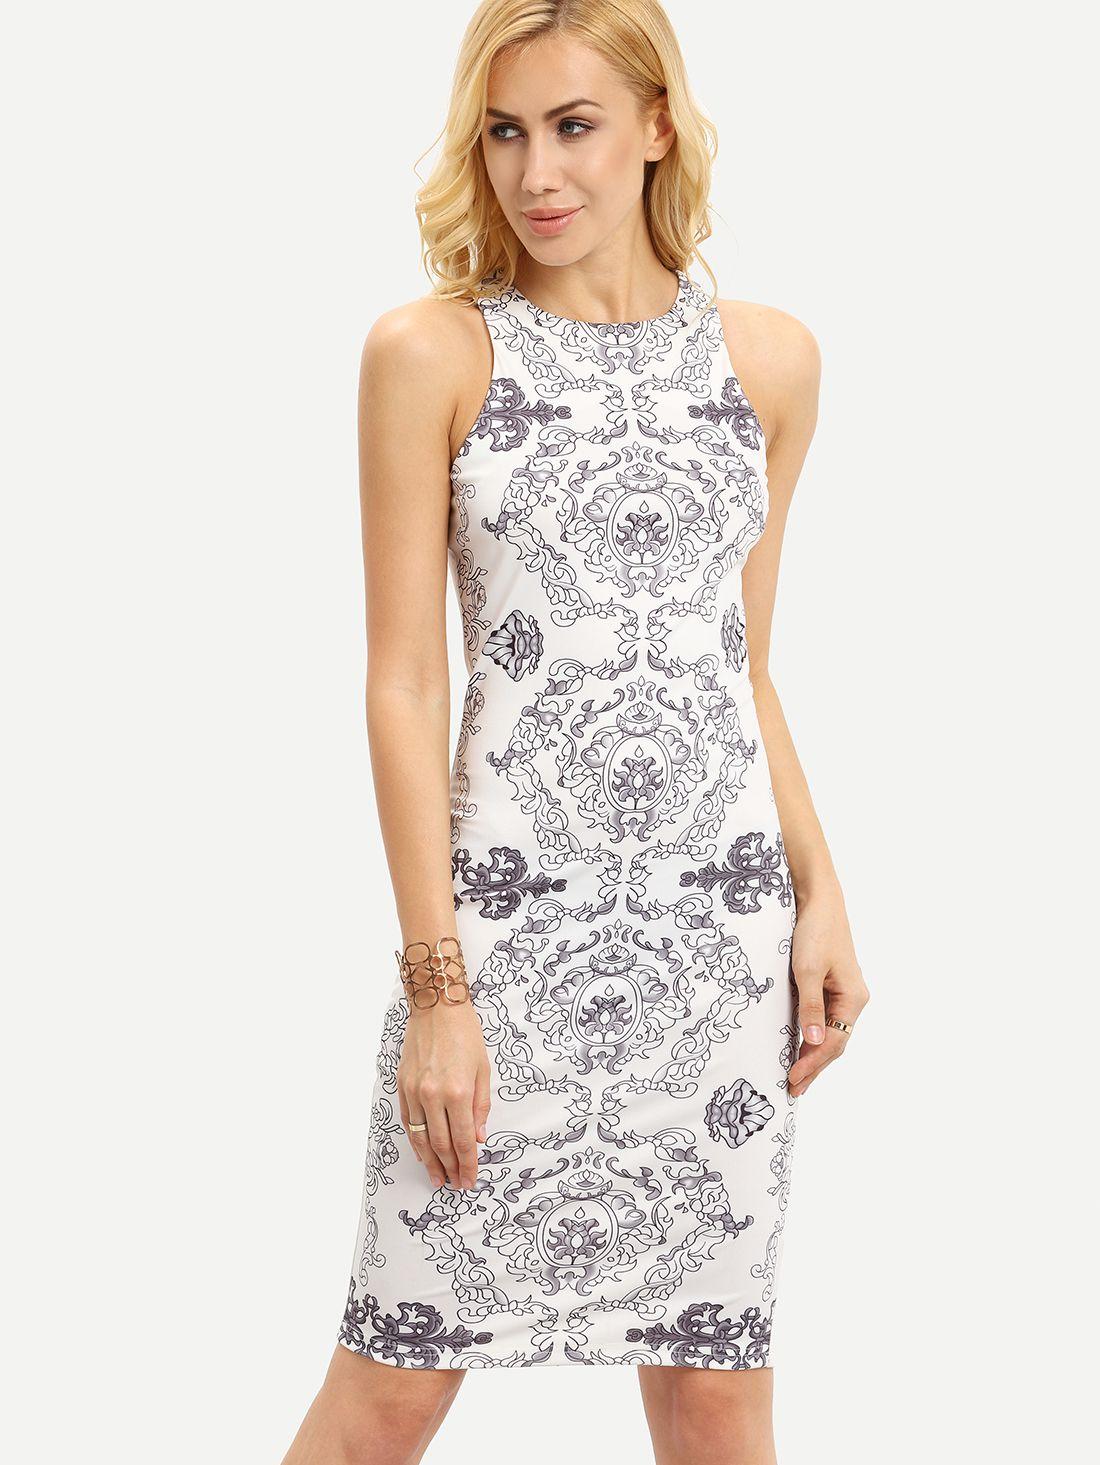 Shop White Sleeveless Tribal Print Sheath Dress online. SheIn offers White Sleeveless Tribal Print Sheath Dress & more to fit your fashionable needs.